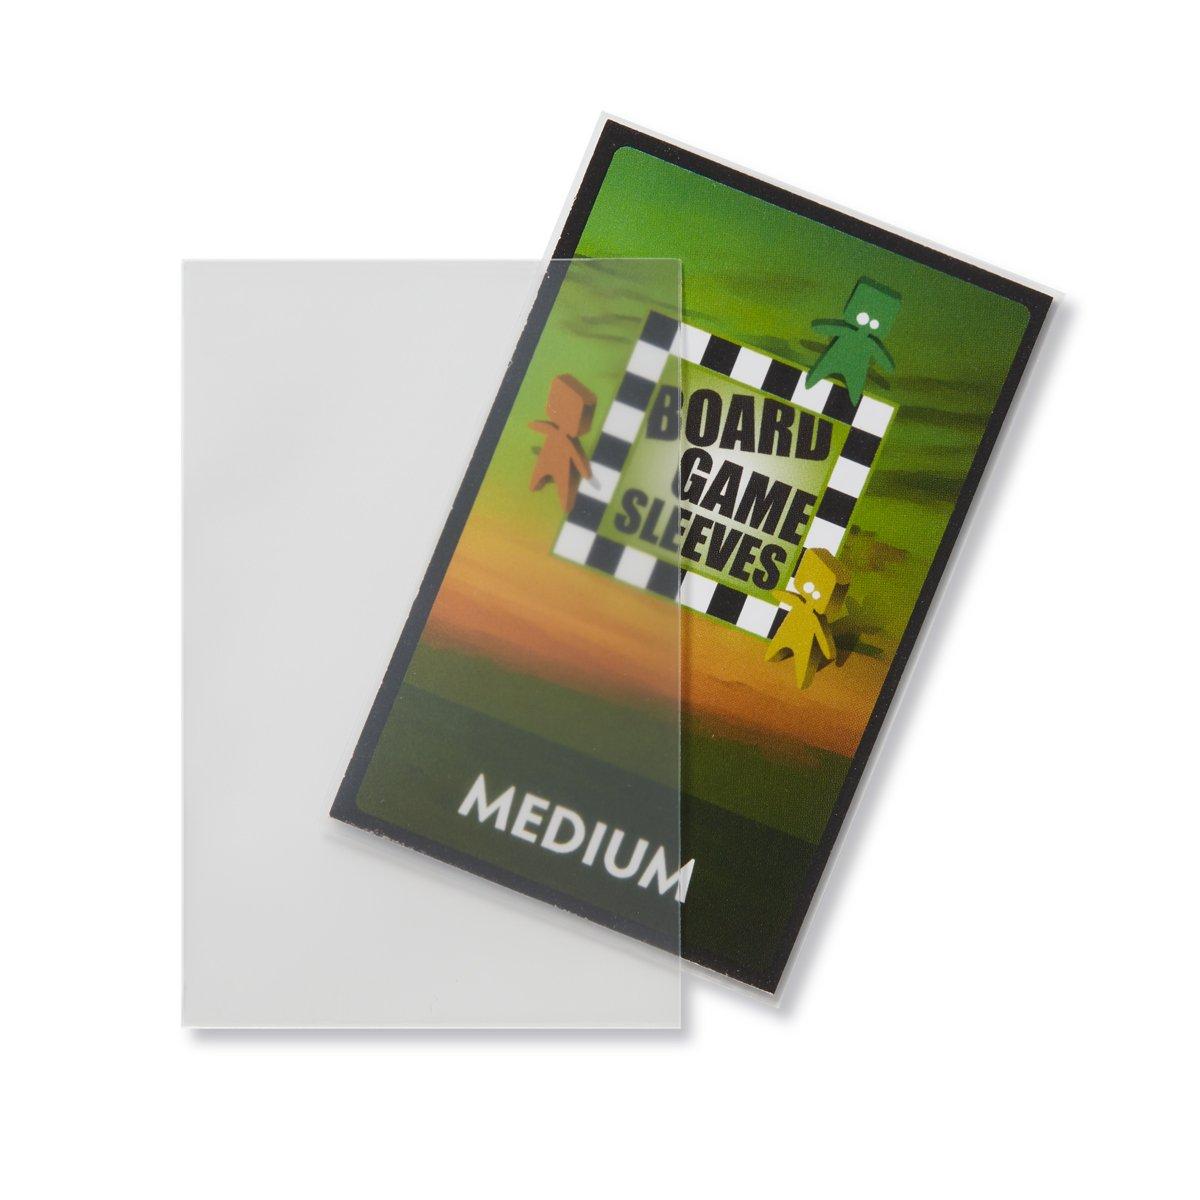 Bundle of 2 Arcane Tinmen Medium Non-Glare Board Game Card Sleeves 57mm x 89mm 100 Sleeves Total